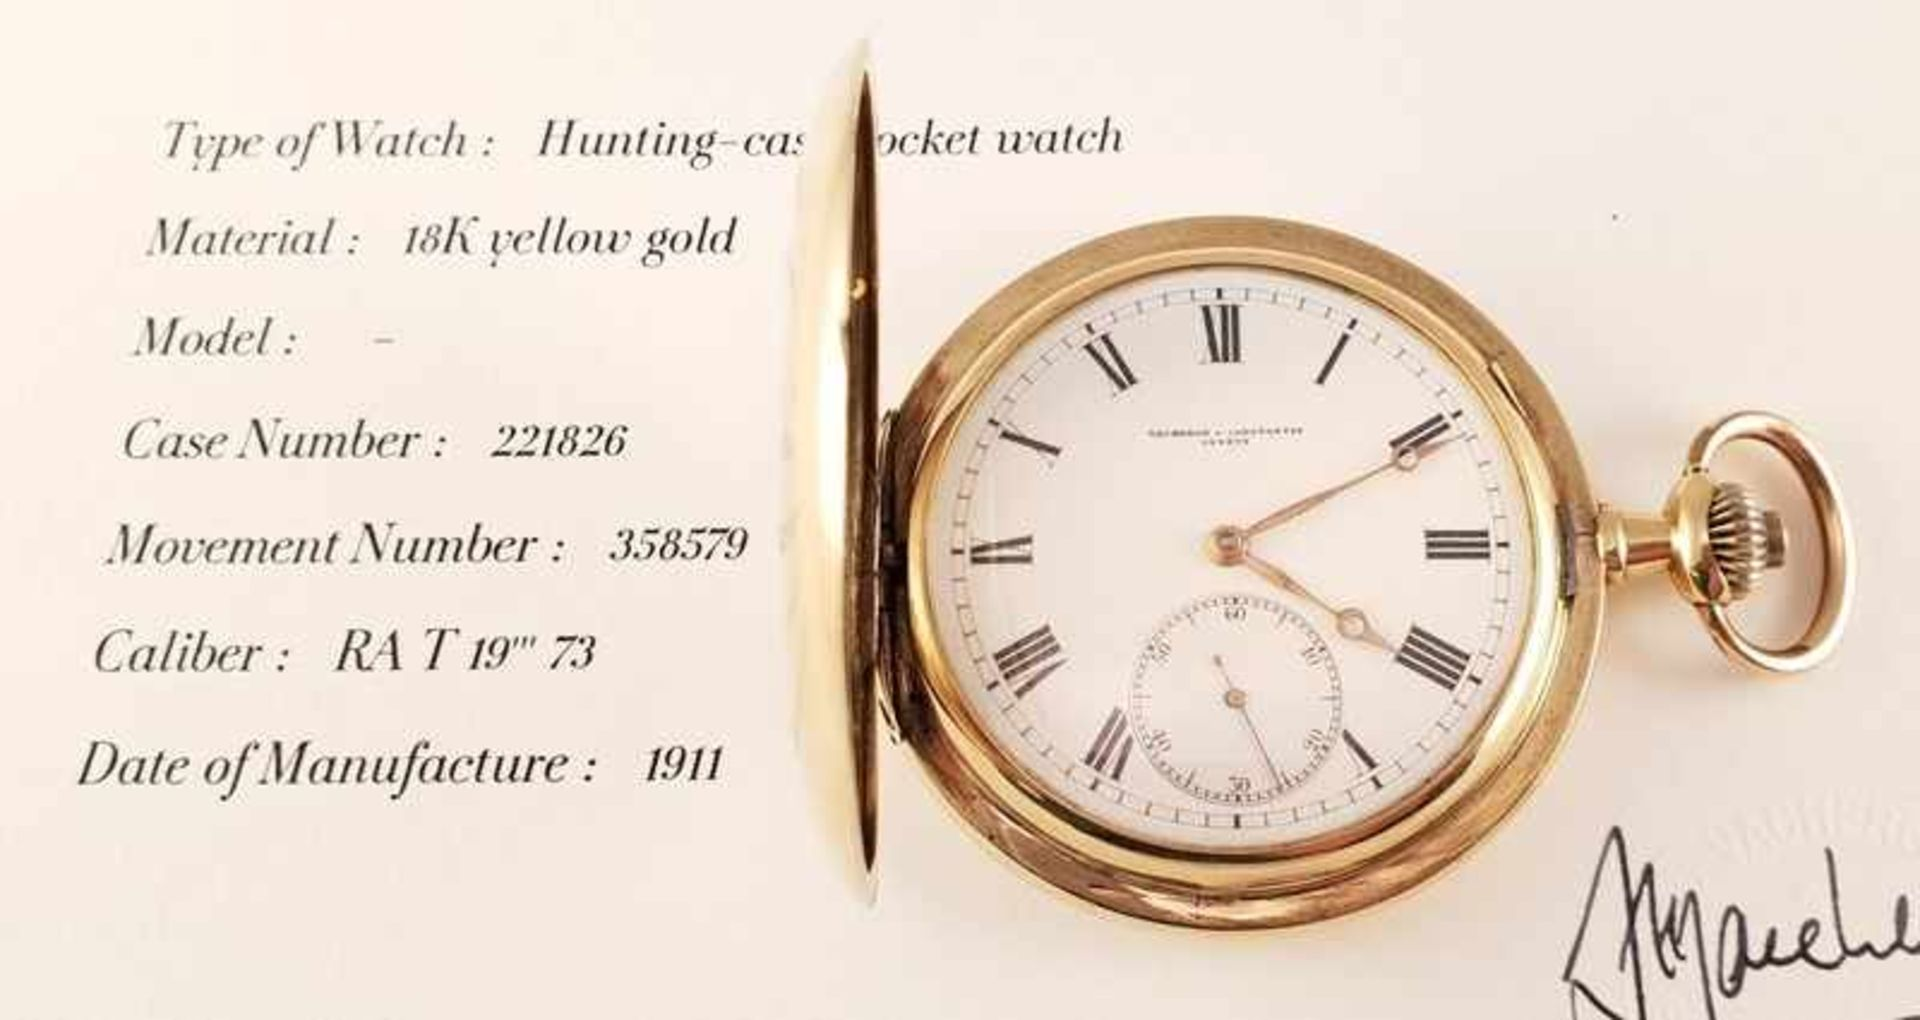 Vacheron Constantin ,Taschenuhr , Gold 750, Gehäusenr.: 221826, Werknr.: 358579 , 1911 , Cal: RA T